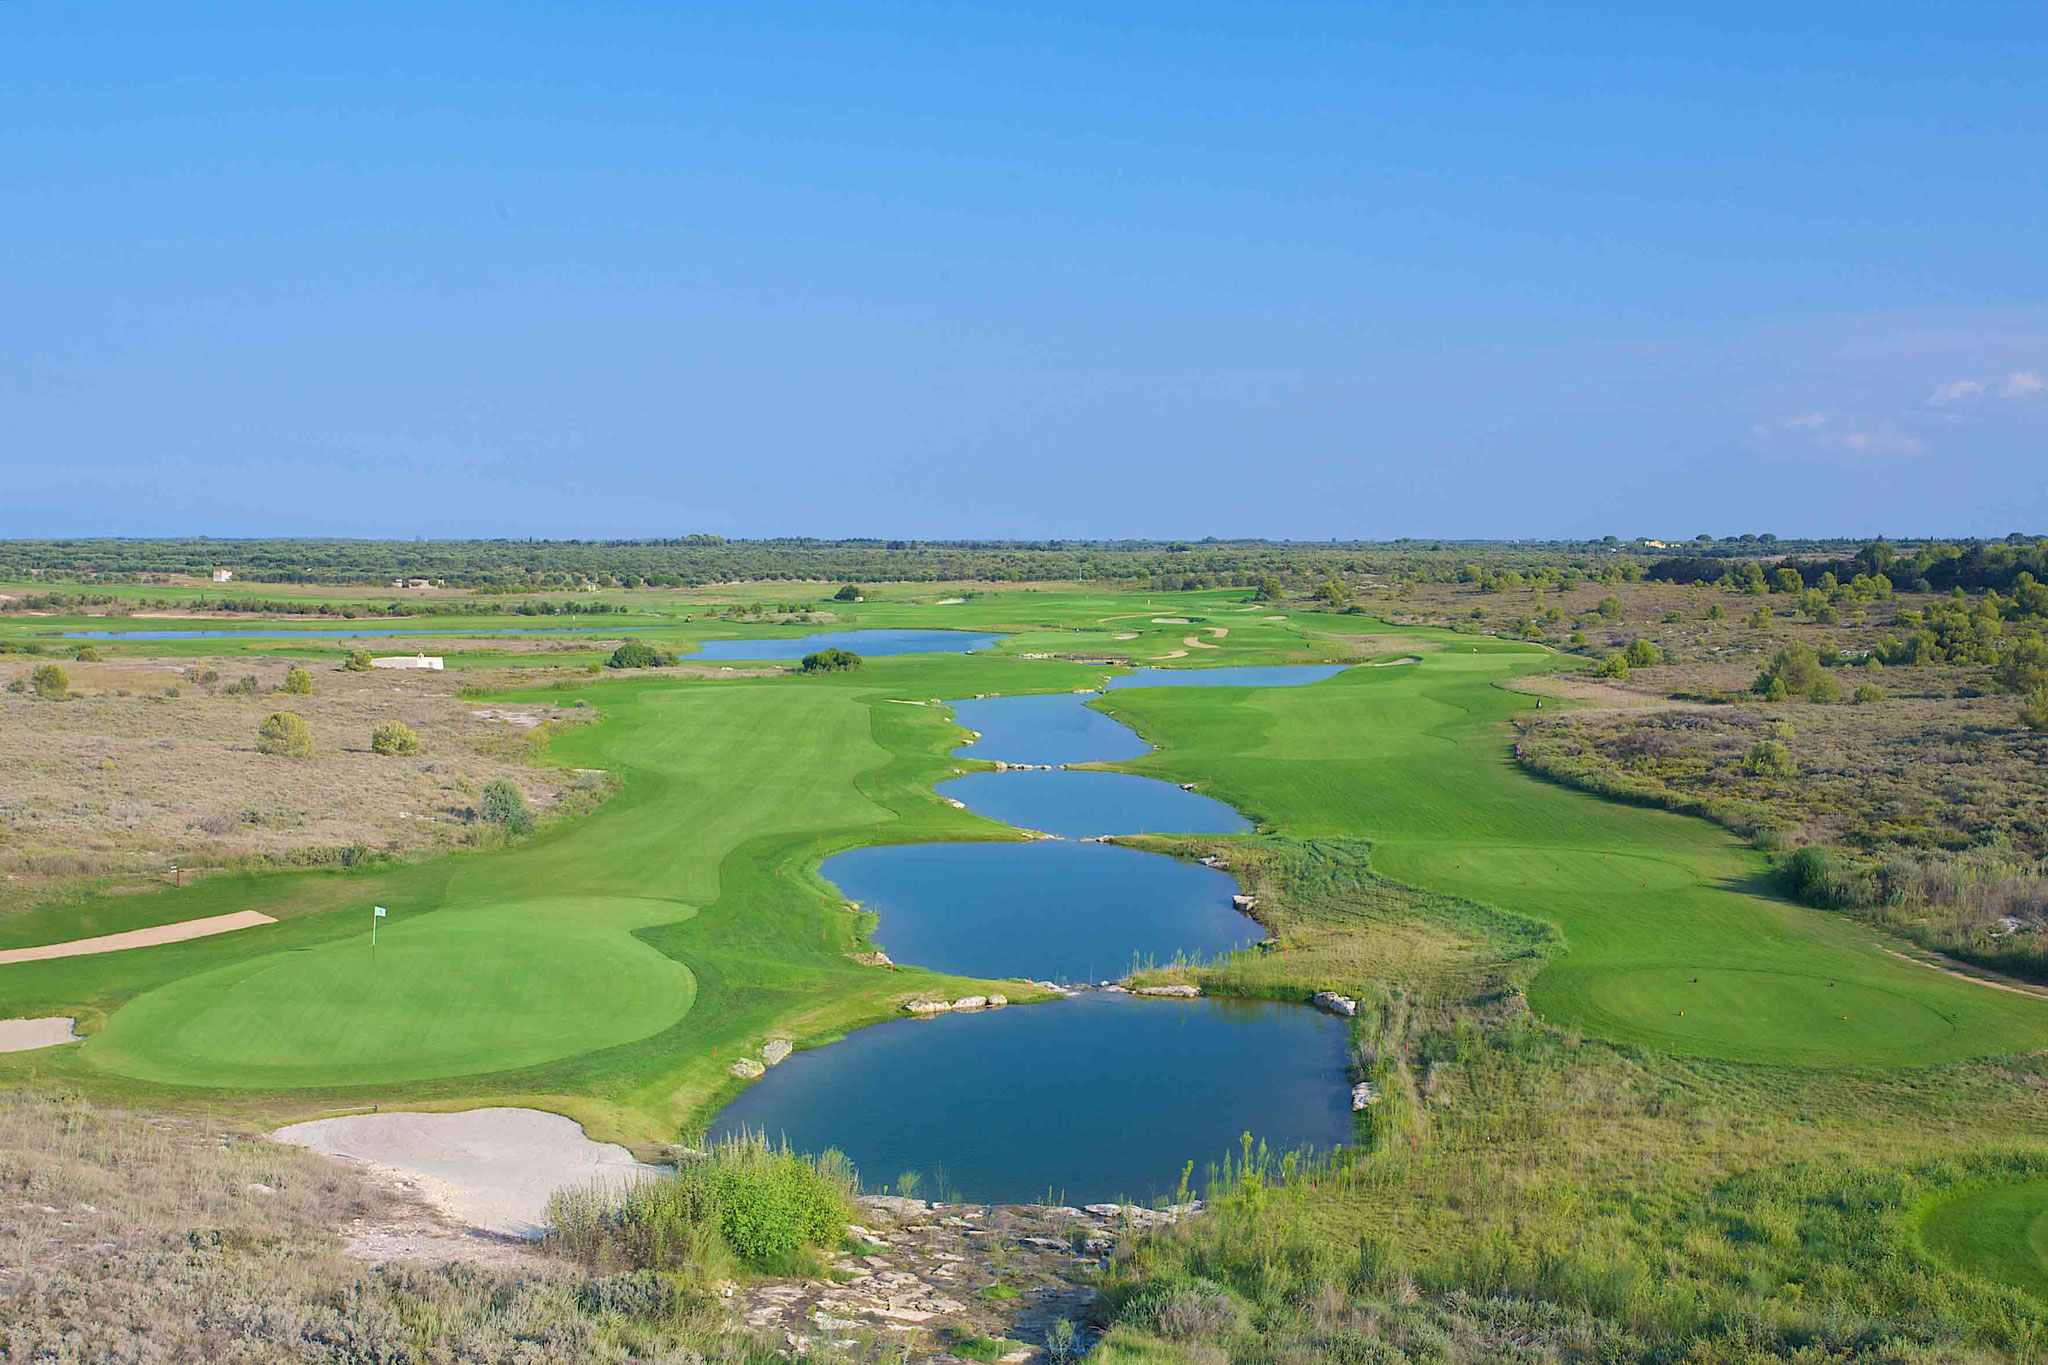 Golf Acaya